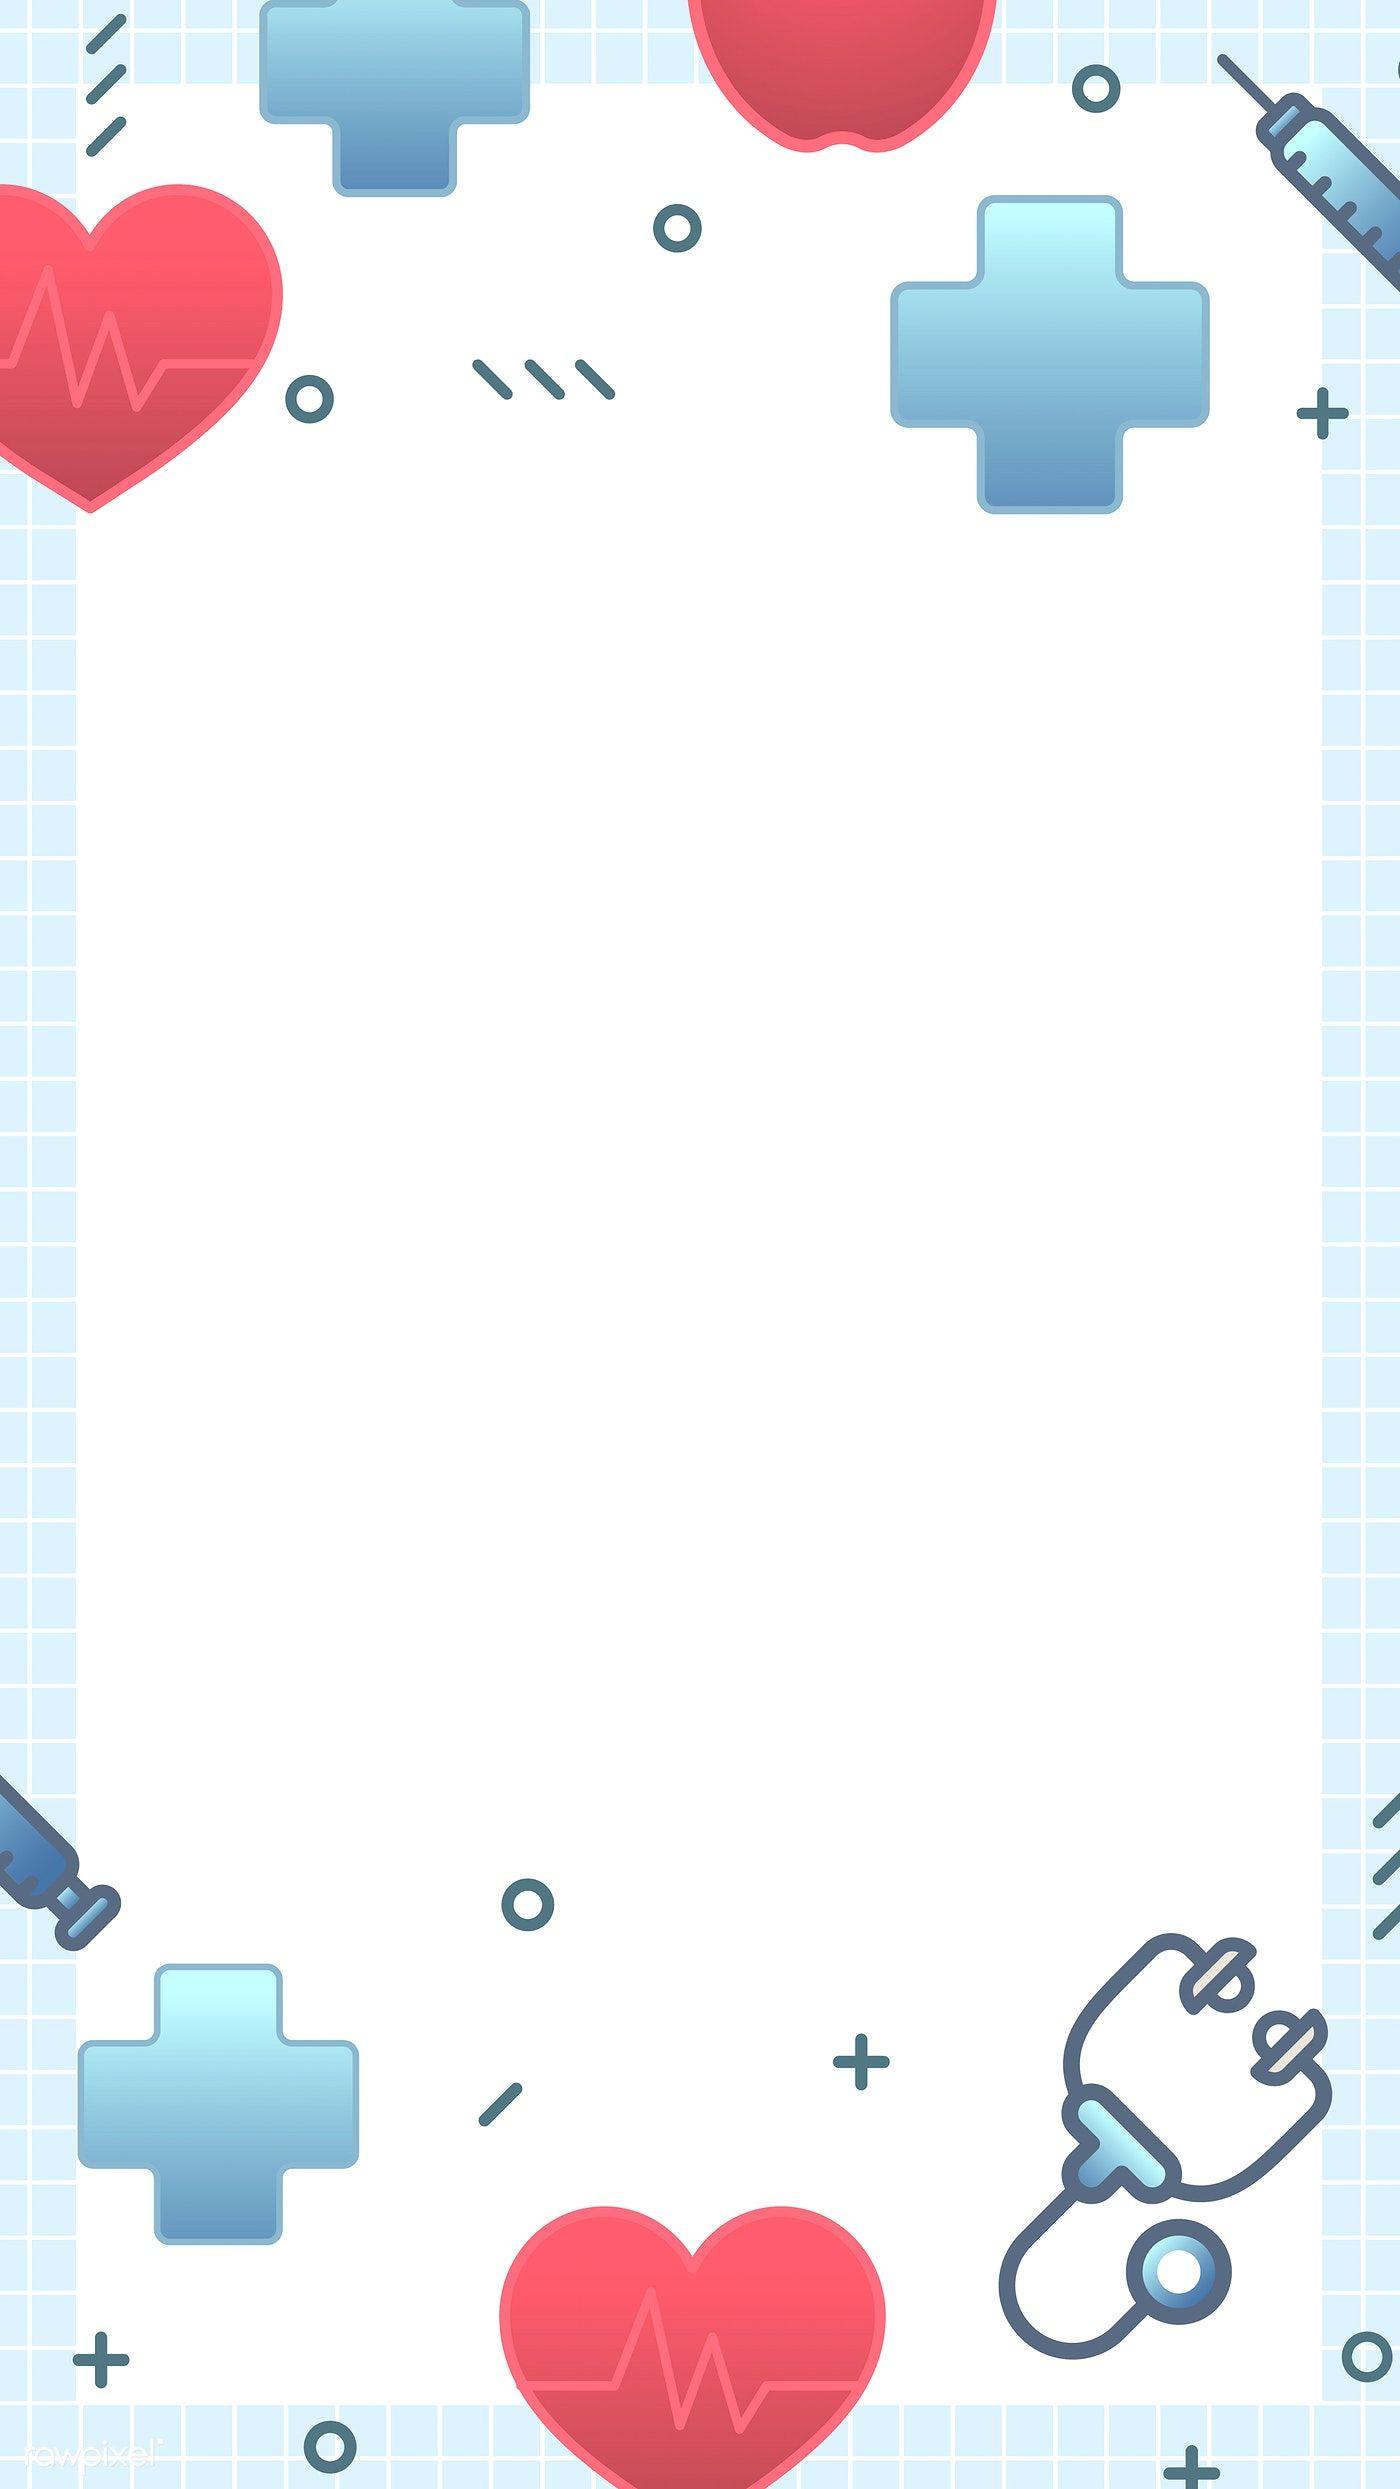 Doctor And Hospital Themed Phone Background Vector Premium Image By Rawpixel Com Kappy Kappy Di 2020 Desain Pamflet Kreatif Kertas Dinding